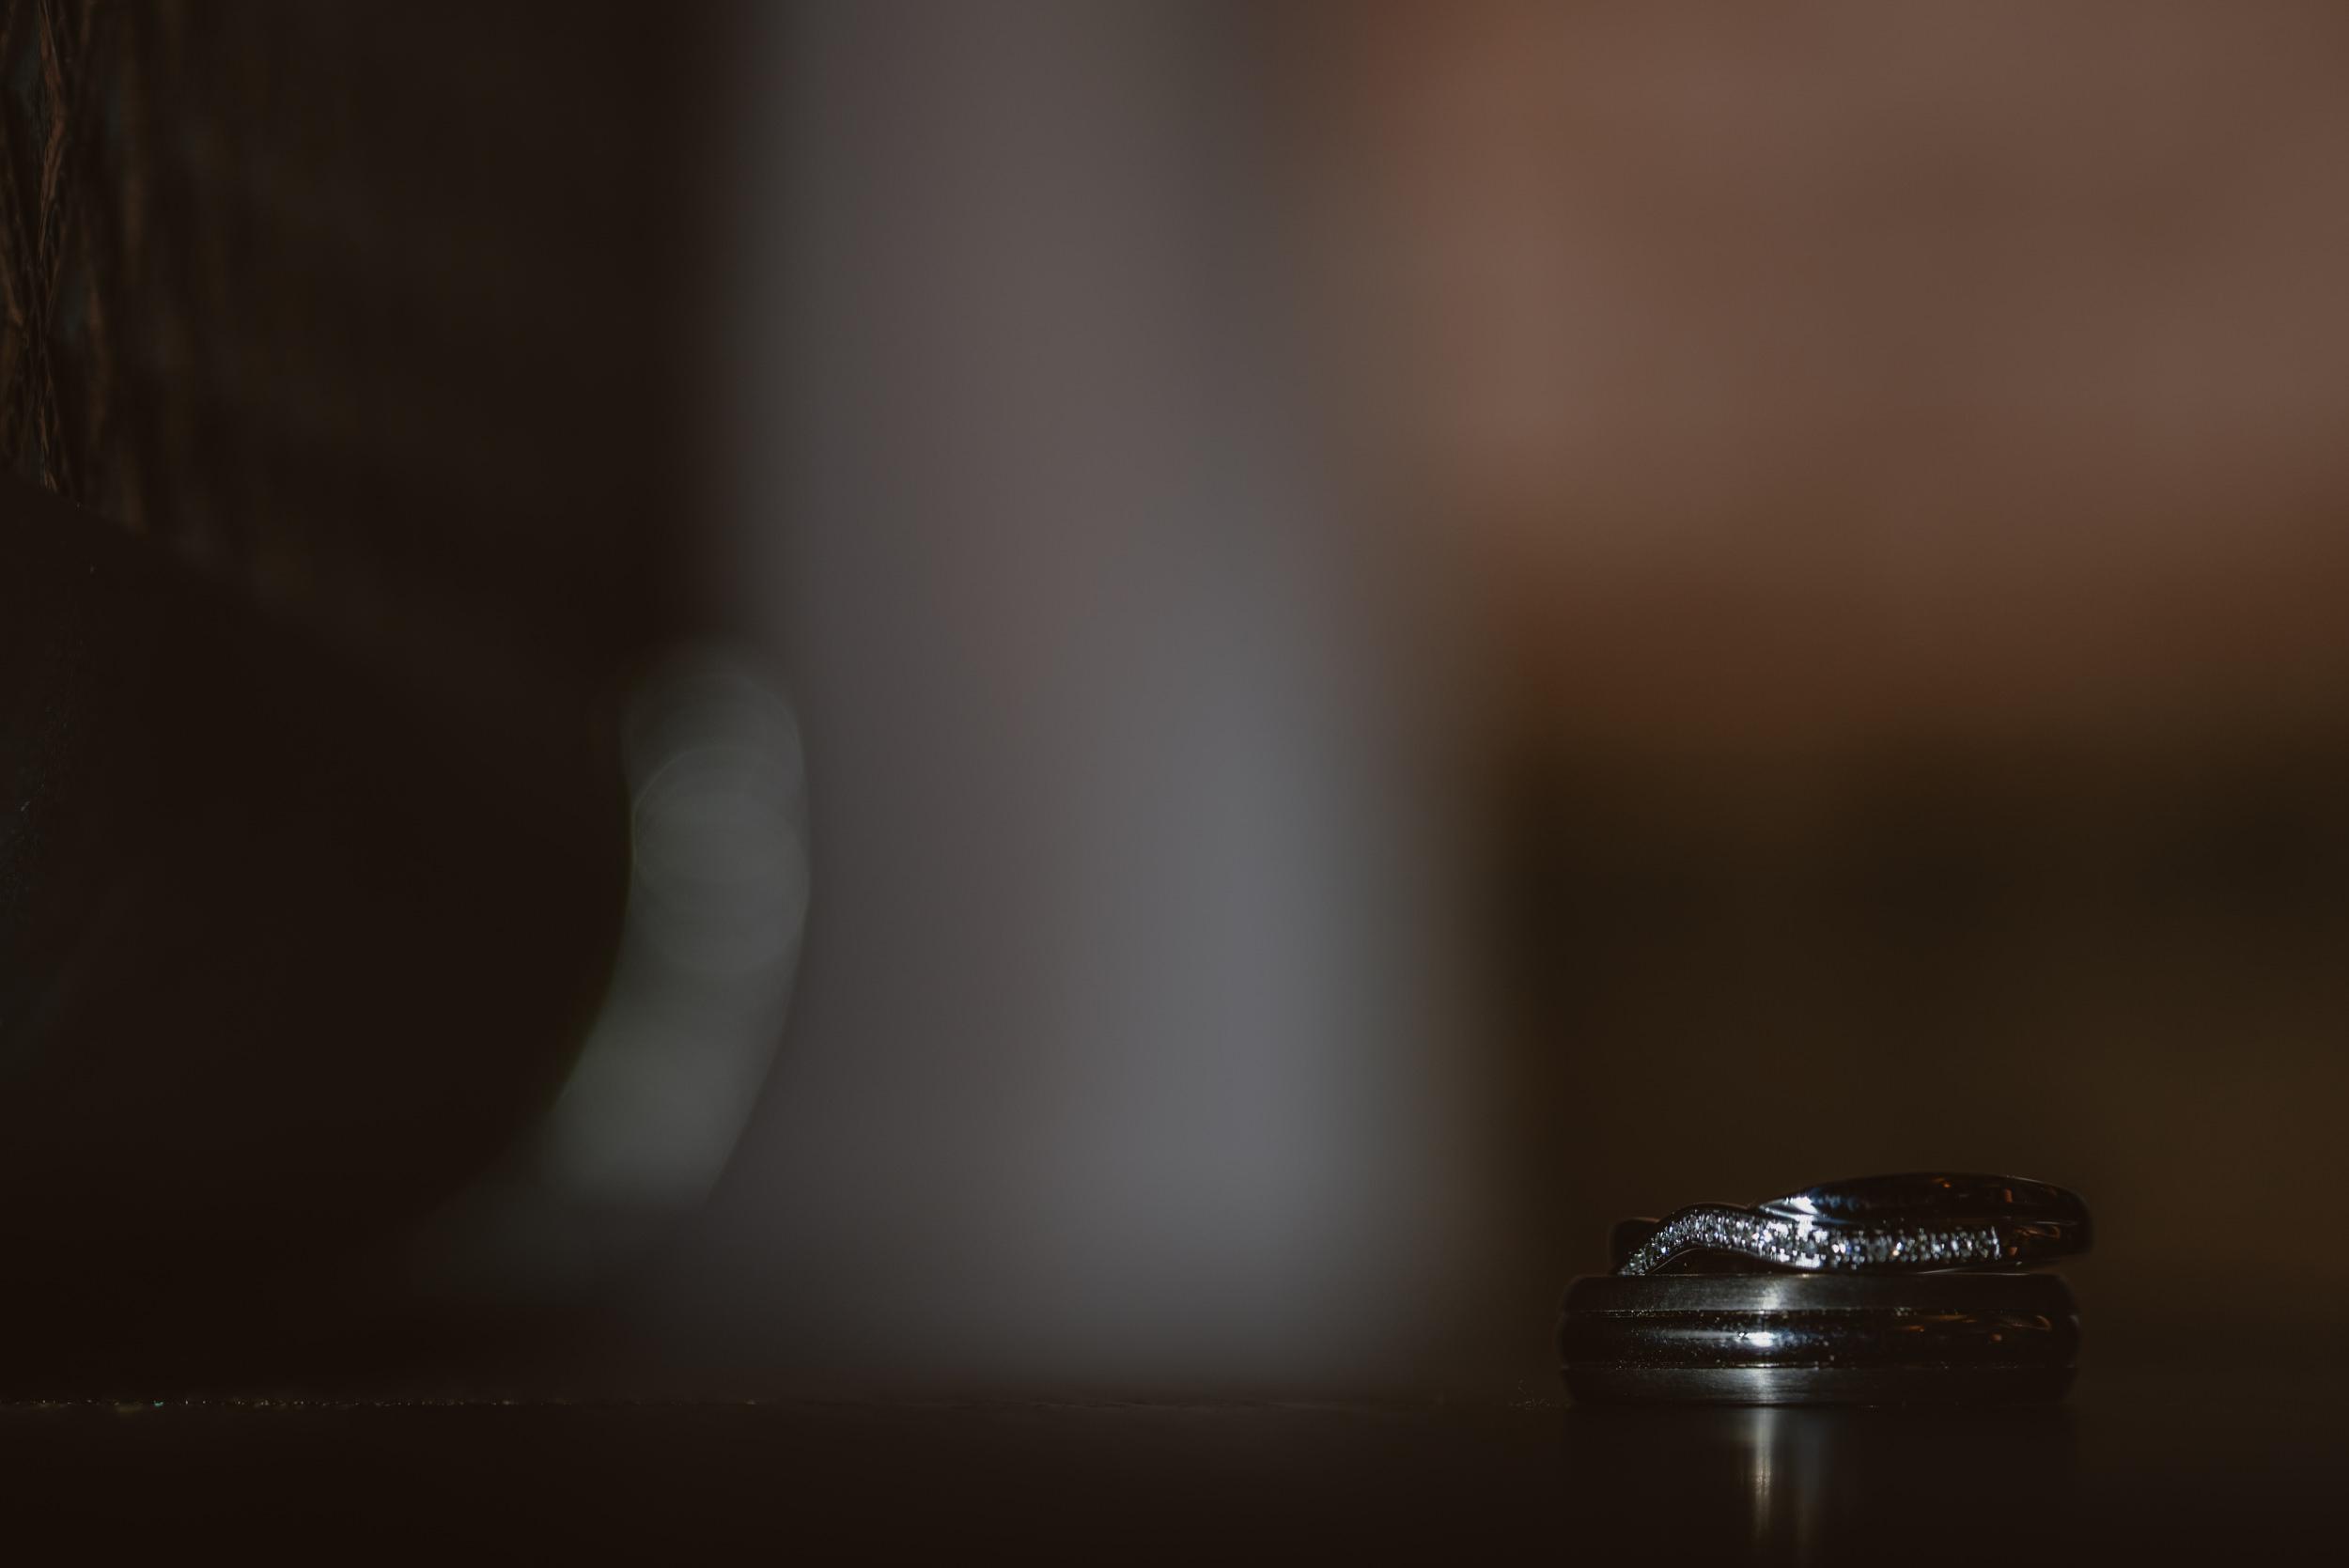 Chantelle-and-Stephen-Old-Thorns-Hotel-Wedding-Liphook-Manu-Mendoza-Wedding-Photography-056.jpg